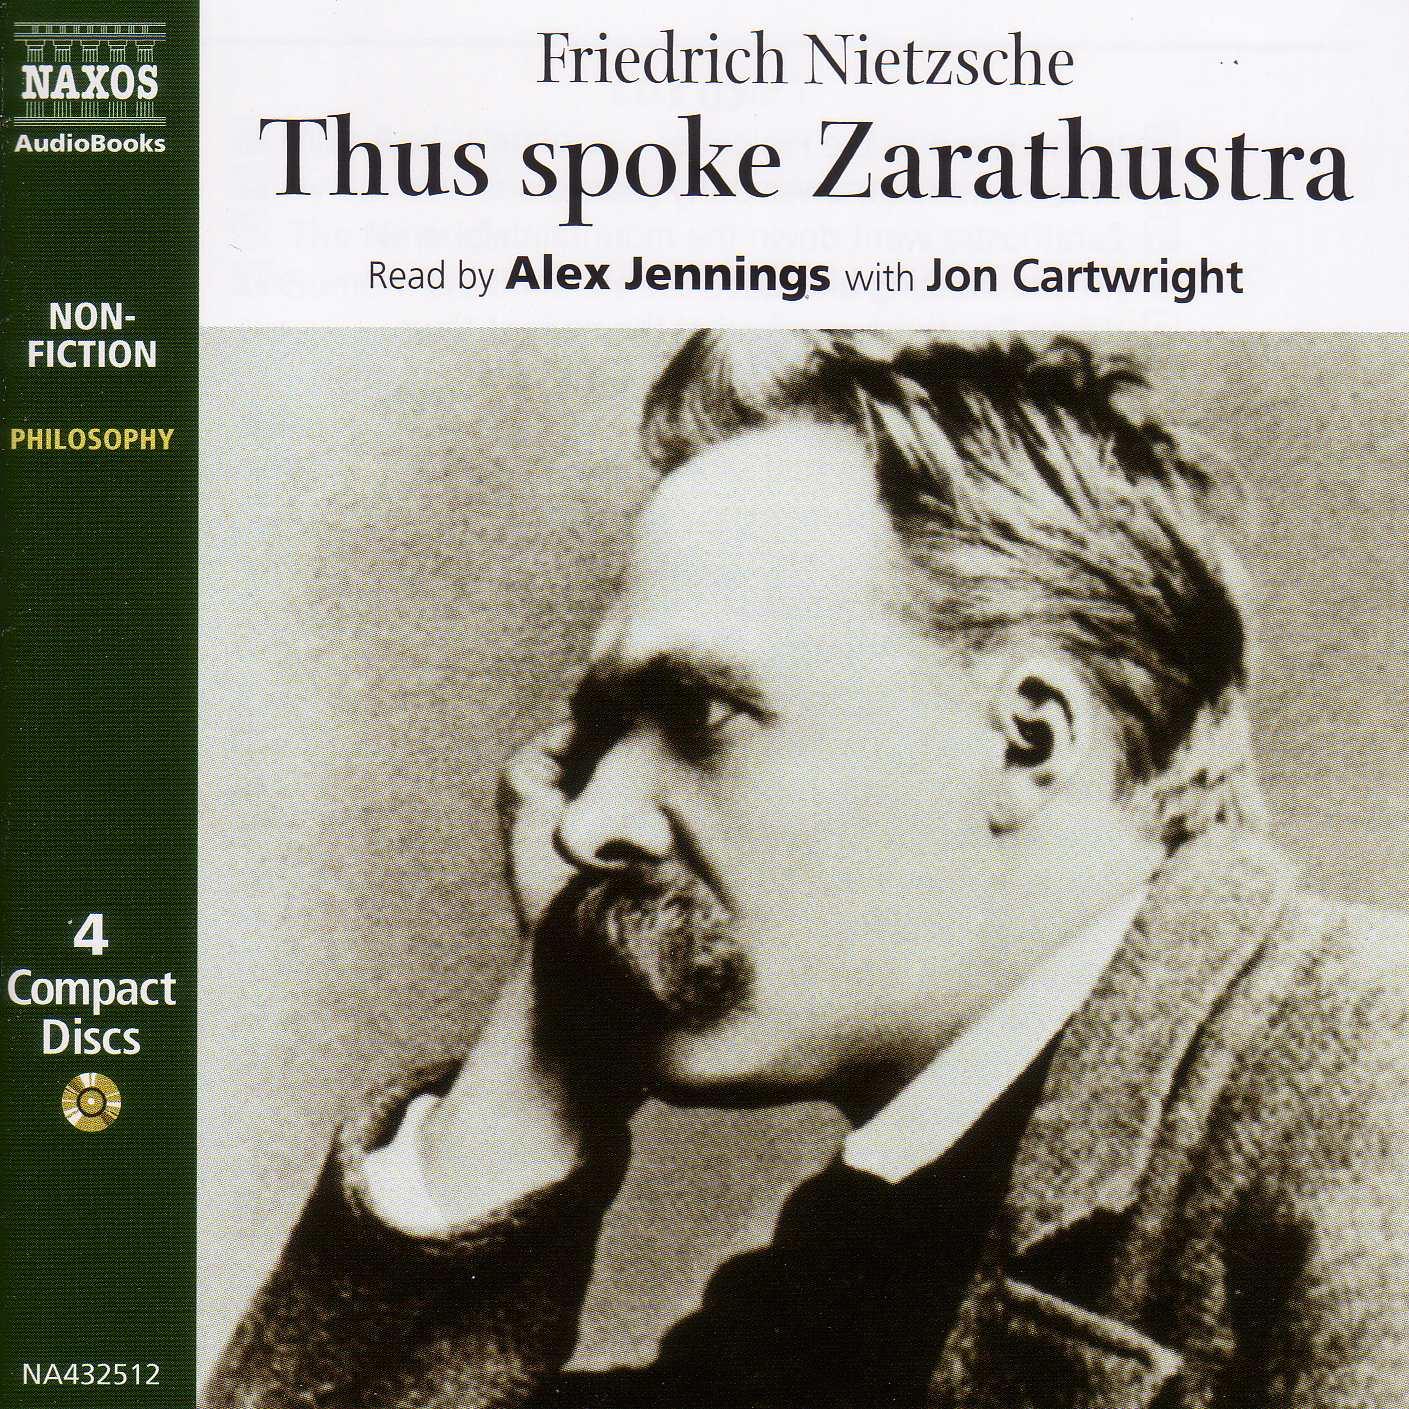 Nietzsche pdf friedrich books